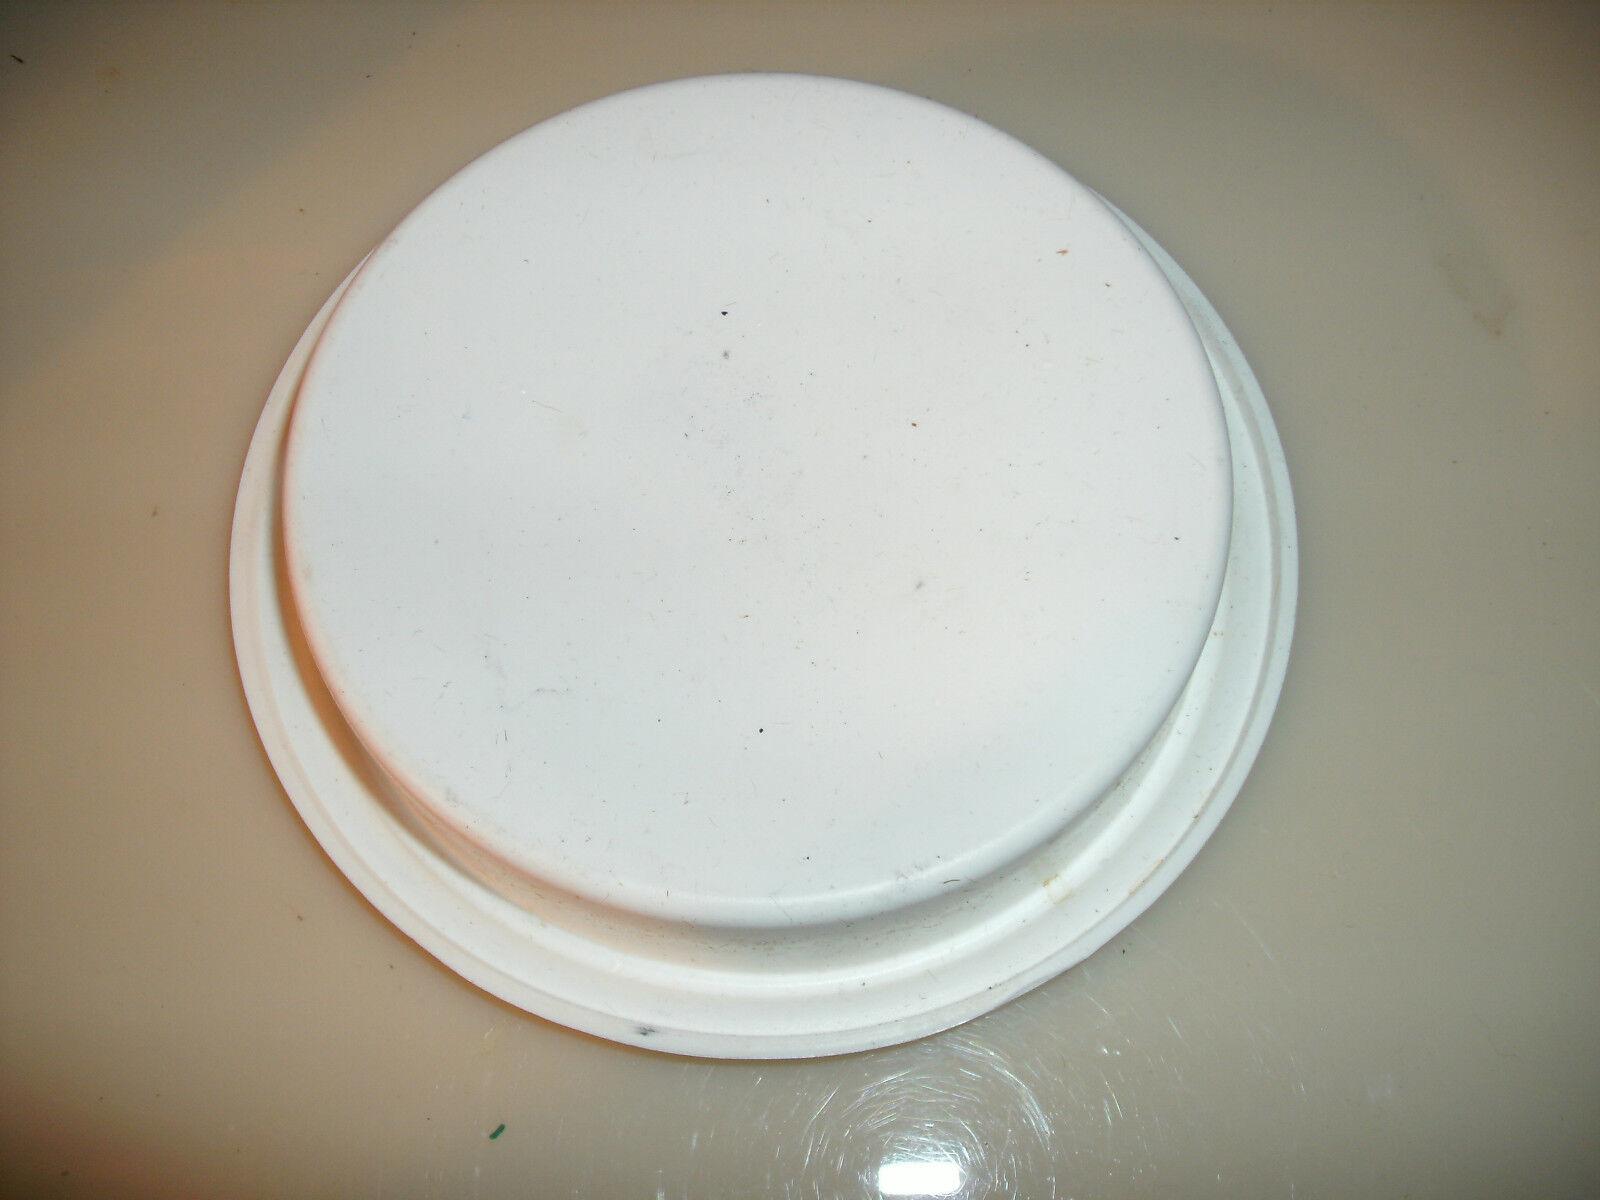 4 ID 4-1//8 OD Fluoropolymer Elastomer Pack of 25 Sterling Seal ORVT045x25 Viton Number-045 Standard O-Ring Pack of 25 70 Durometer Hardness 4-1//8 OD Sur-Seal 4 ID